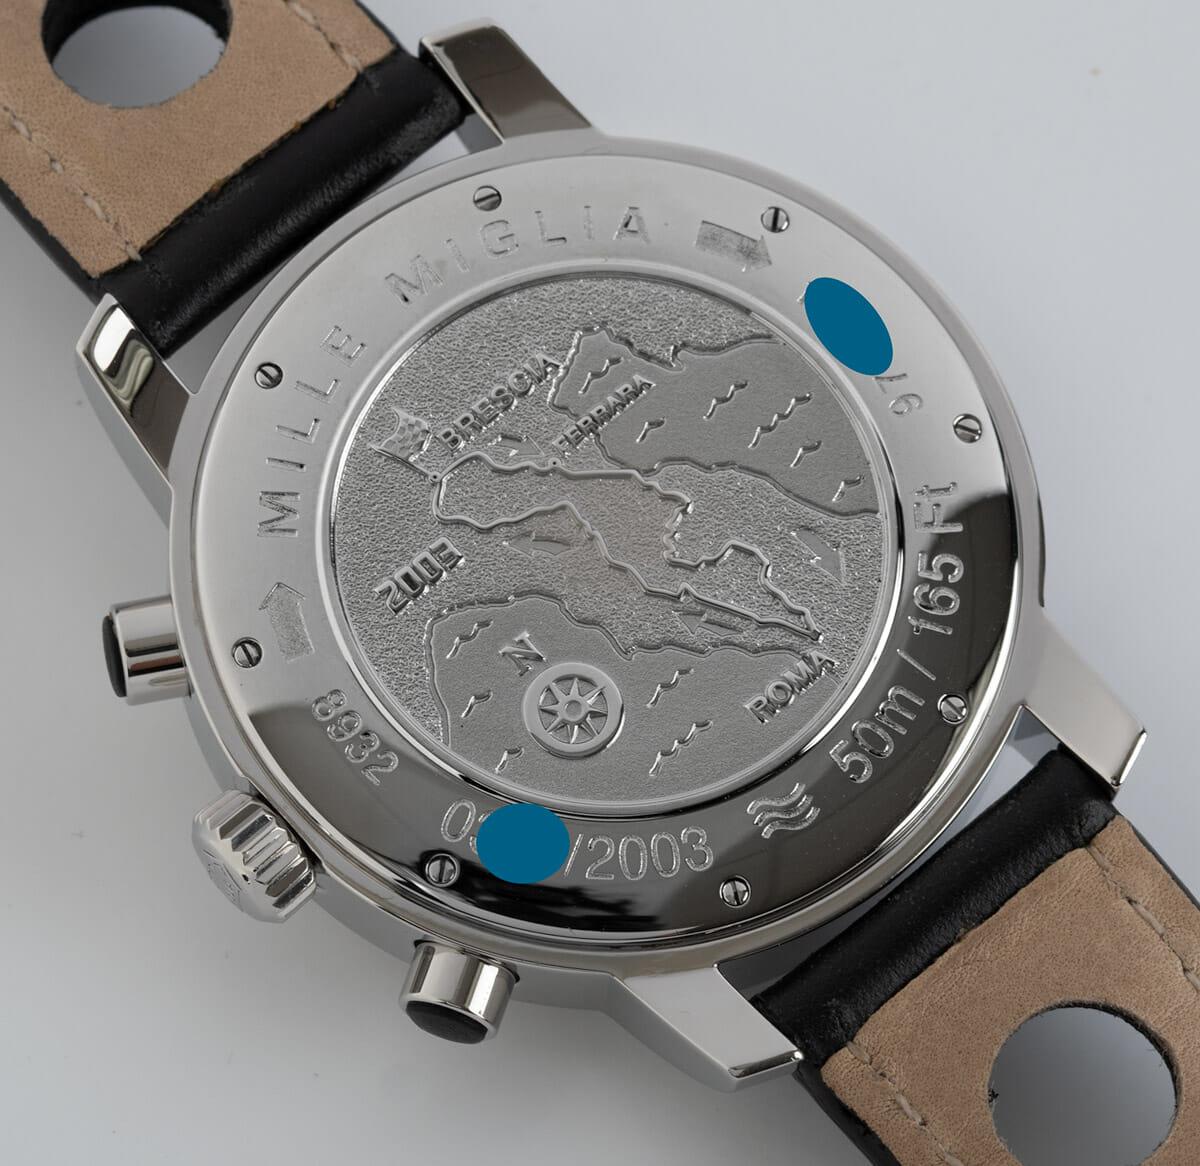 Caseback of Mille Miglia Chronograph